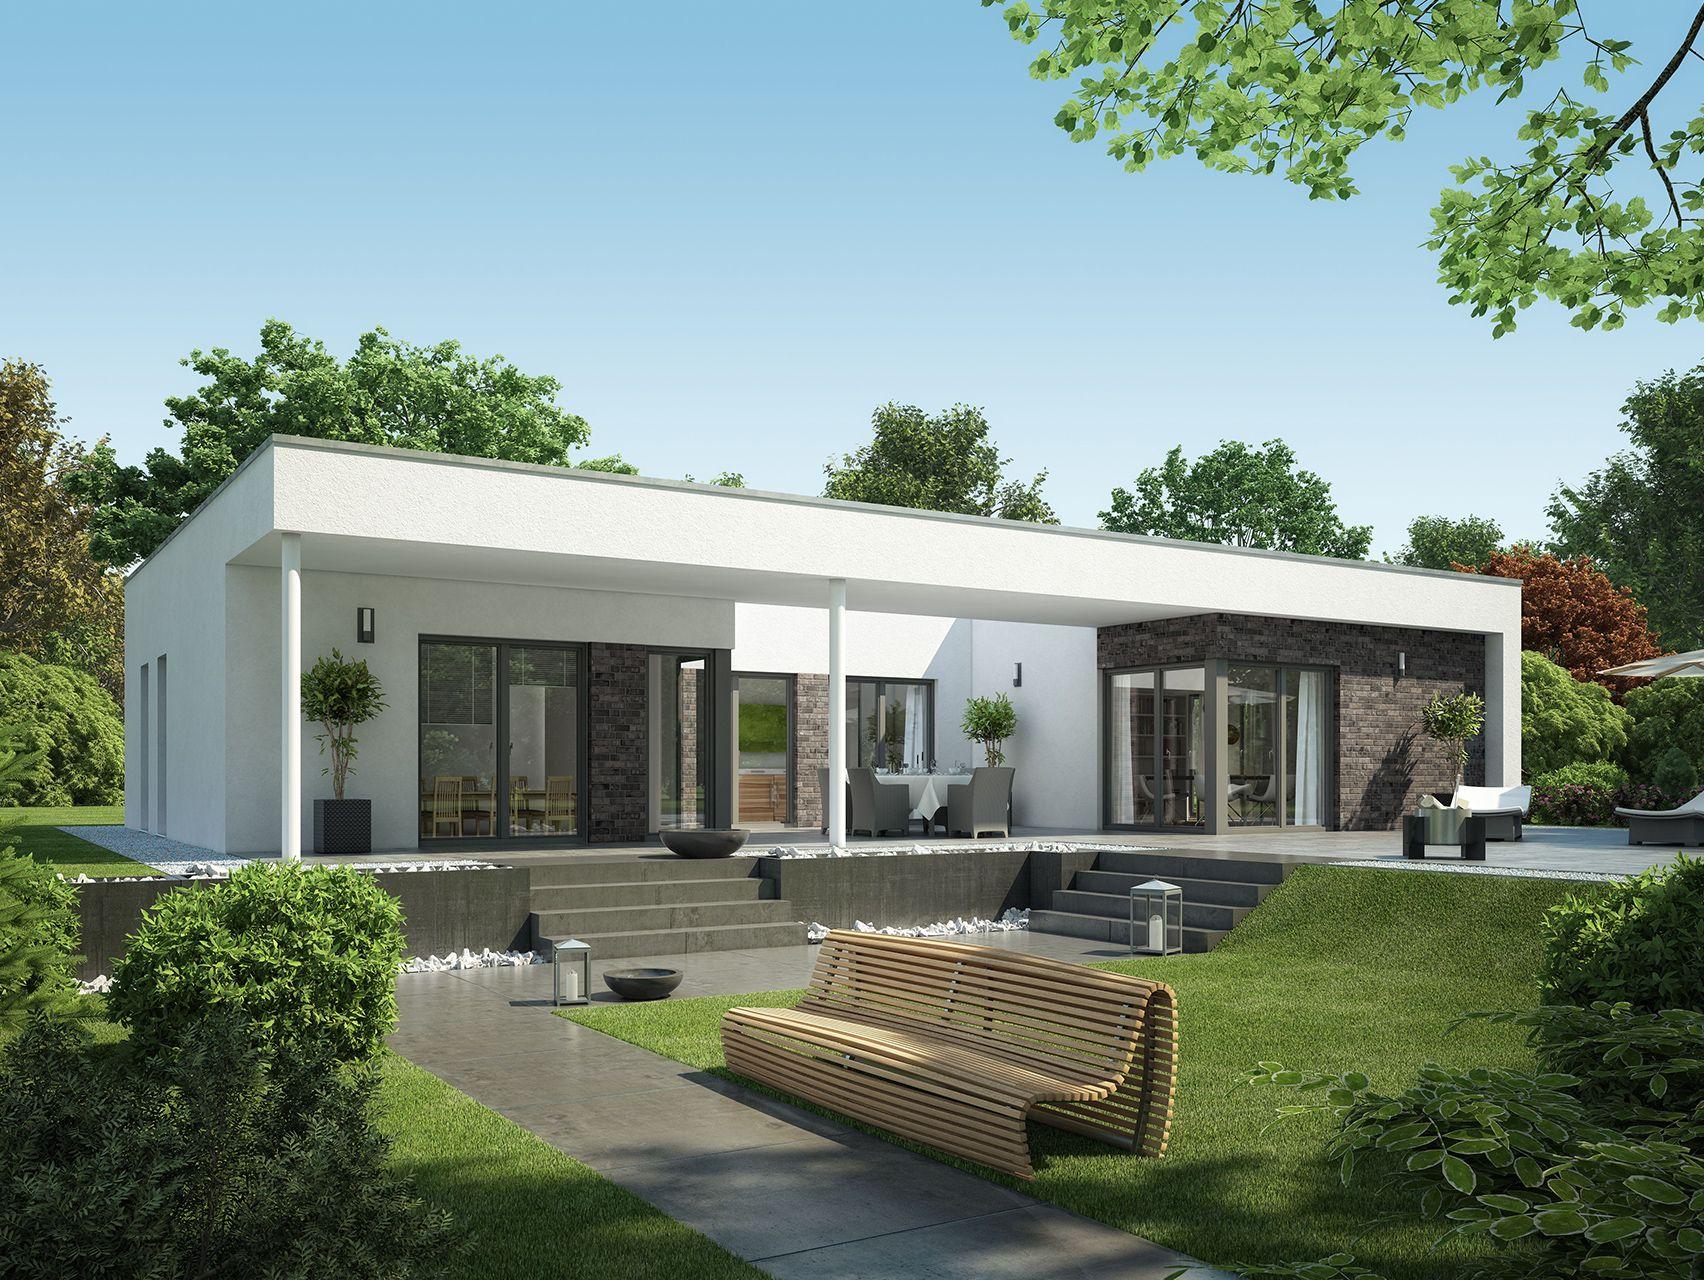 haeuser finden detail planungsvorschlag in u form hausbau pinterest haus. Black Bedroom Furniture Sets. Home Design Ideas